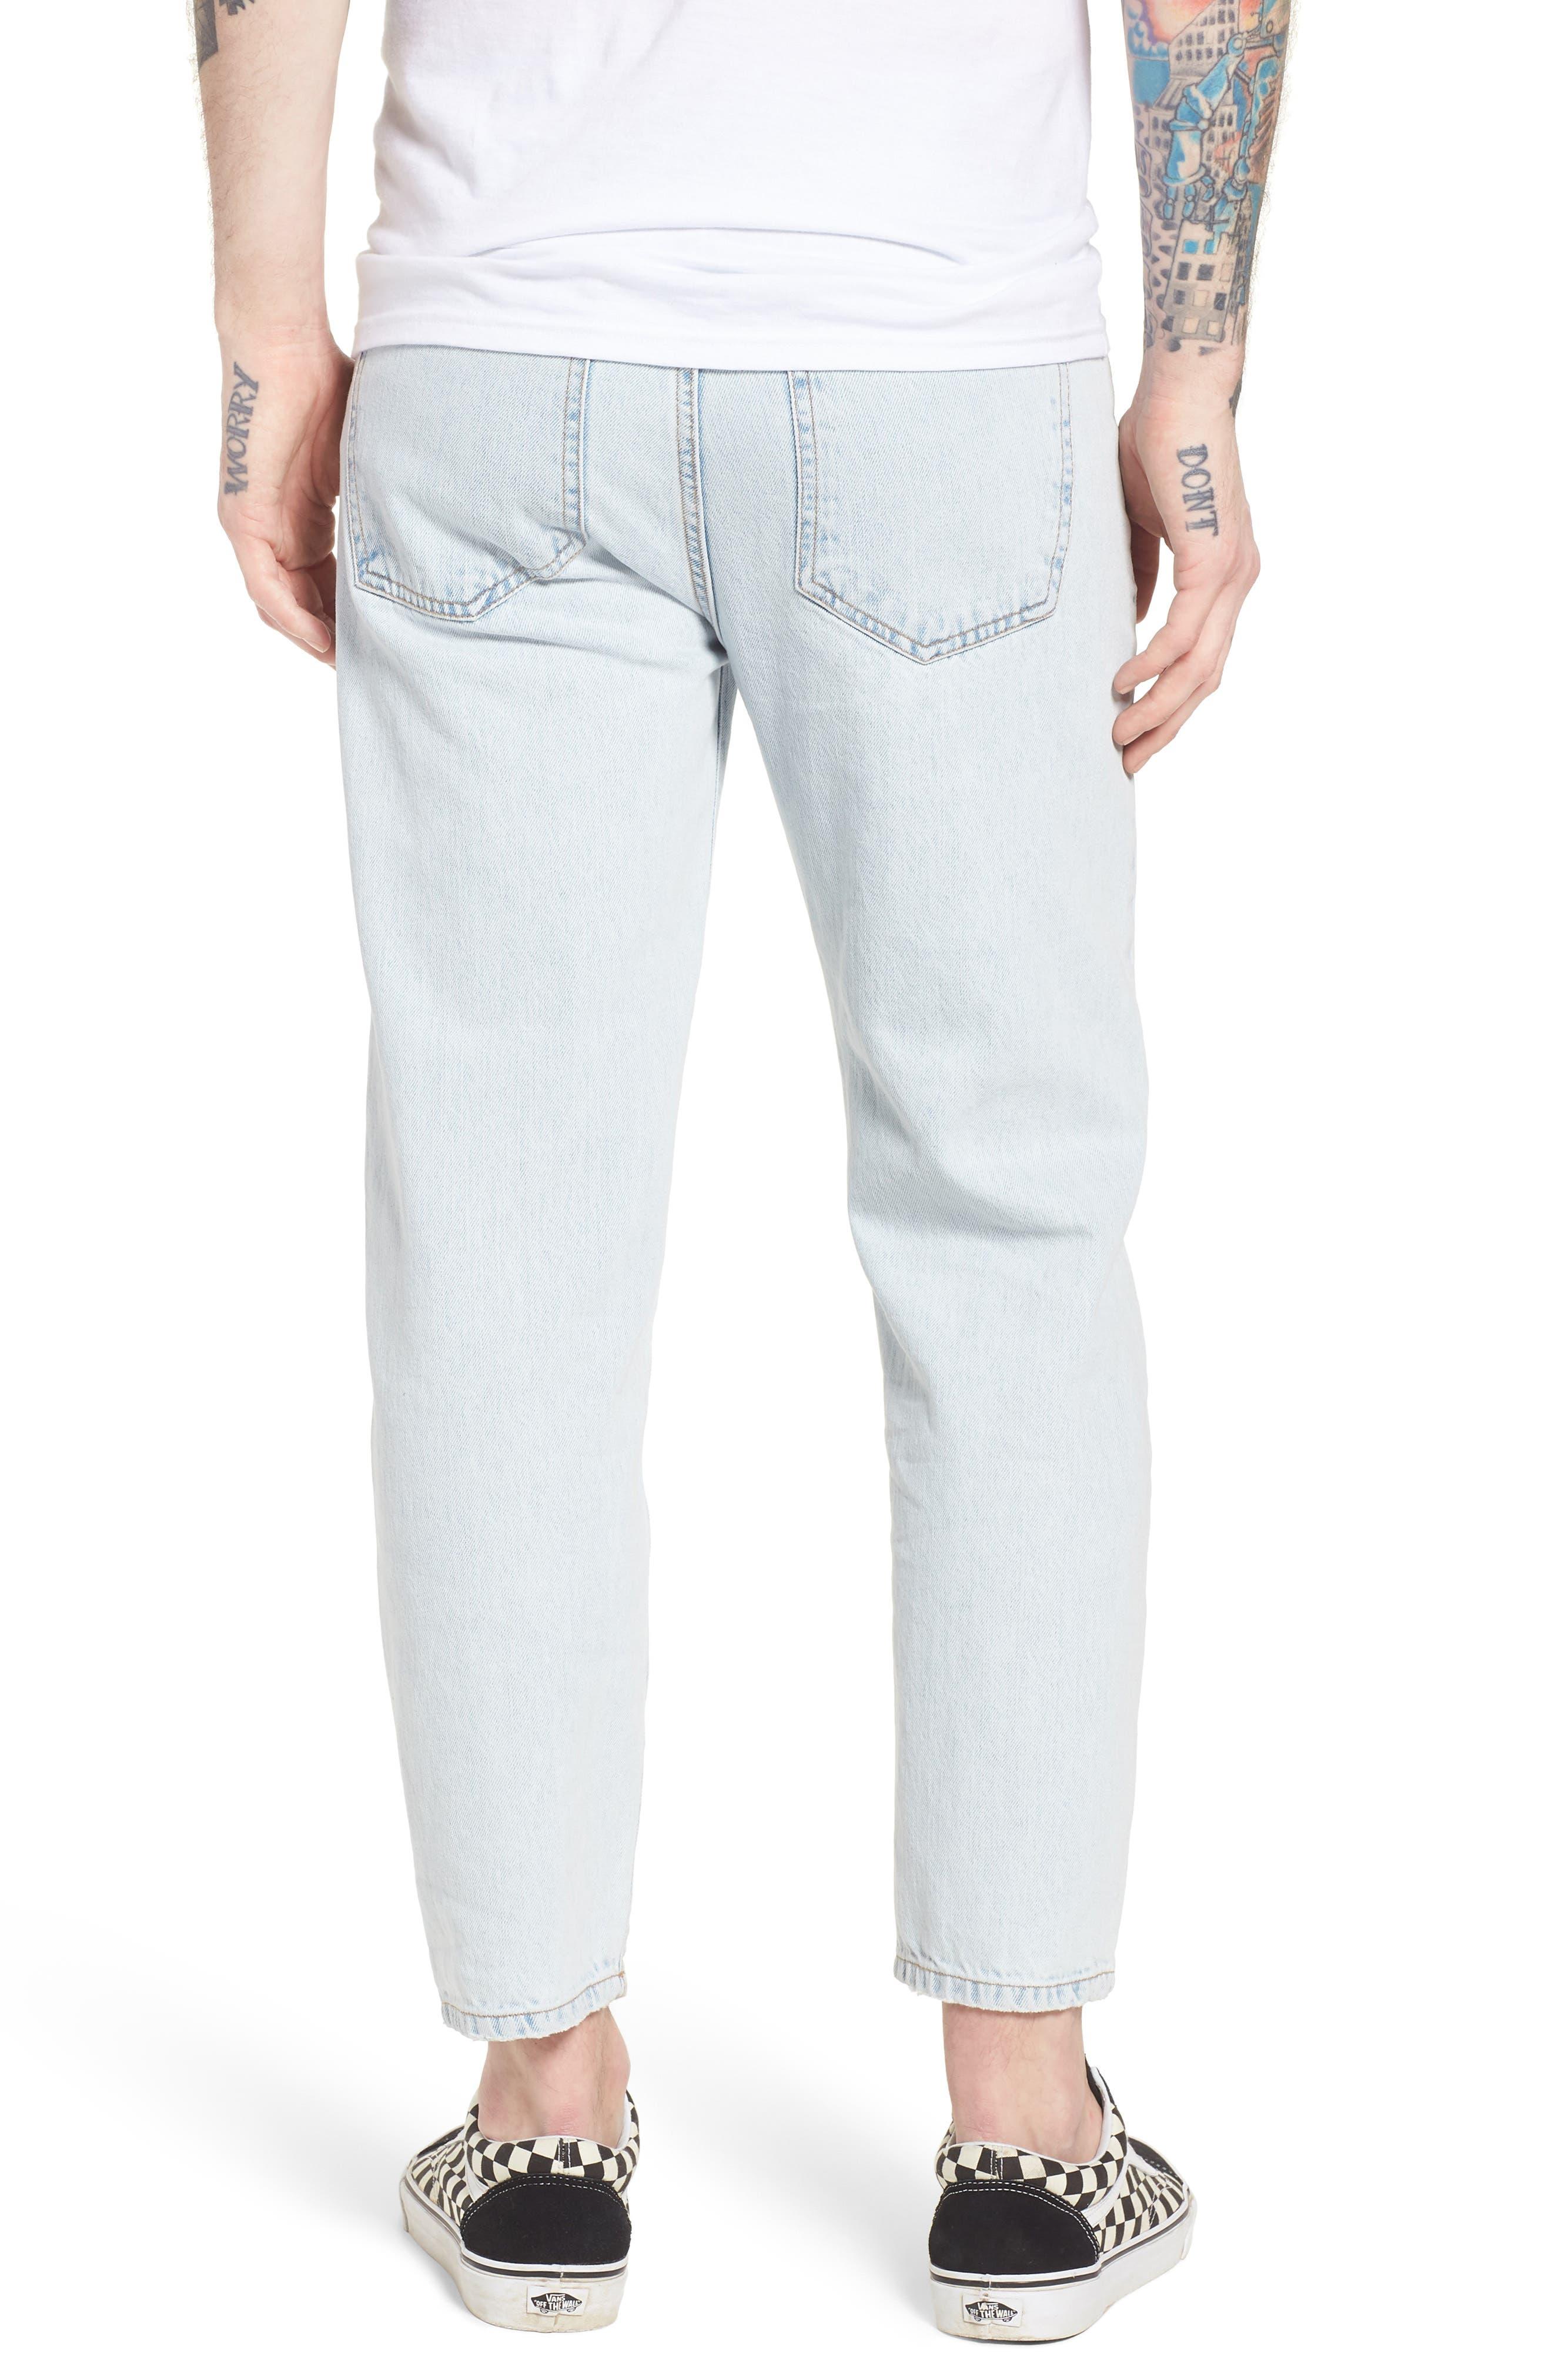 Otis Straight Fit Jeans,                             Alternate thumbnail 2, color,                             401